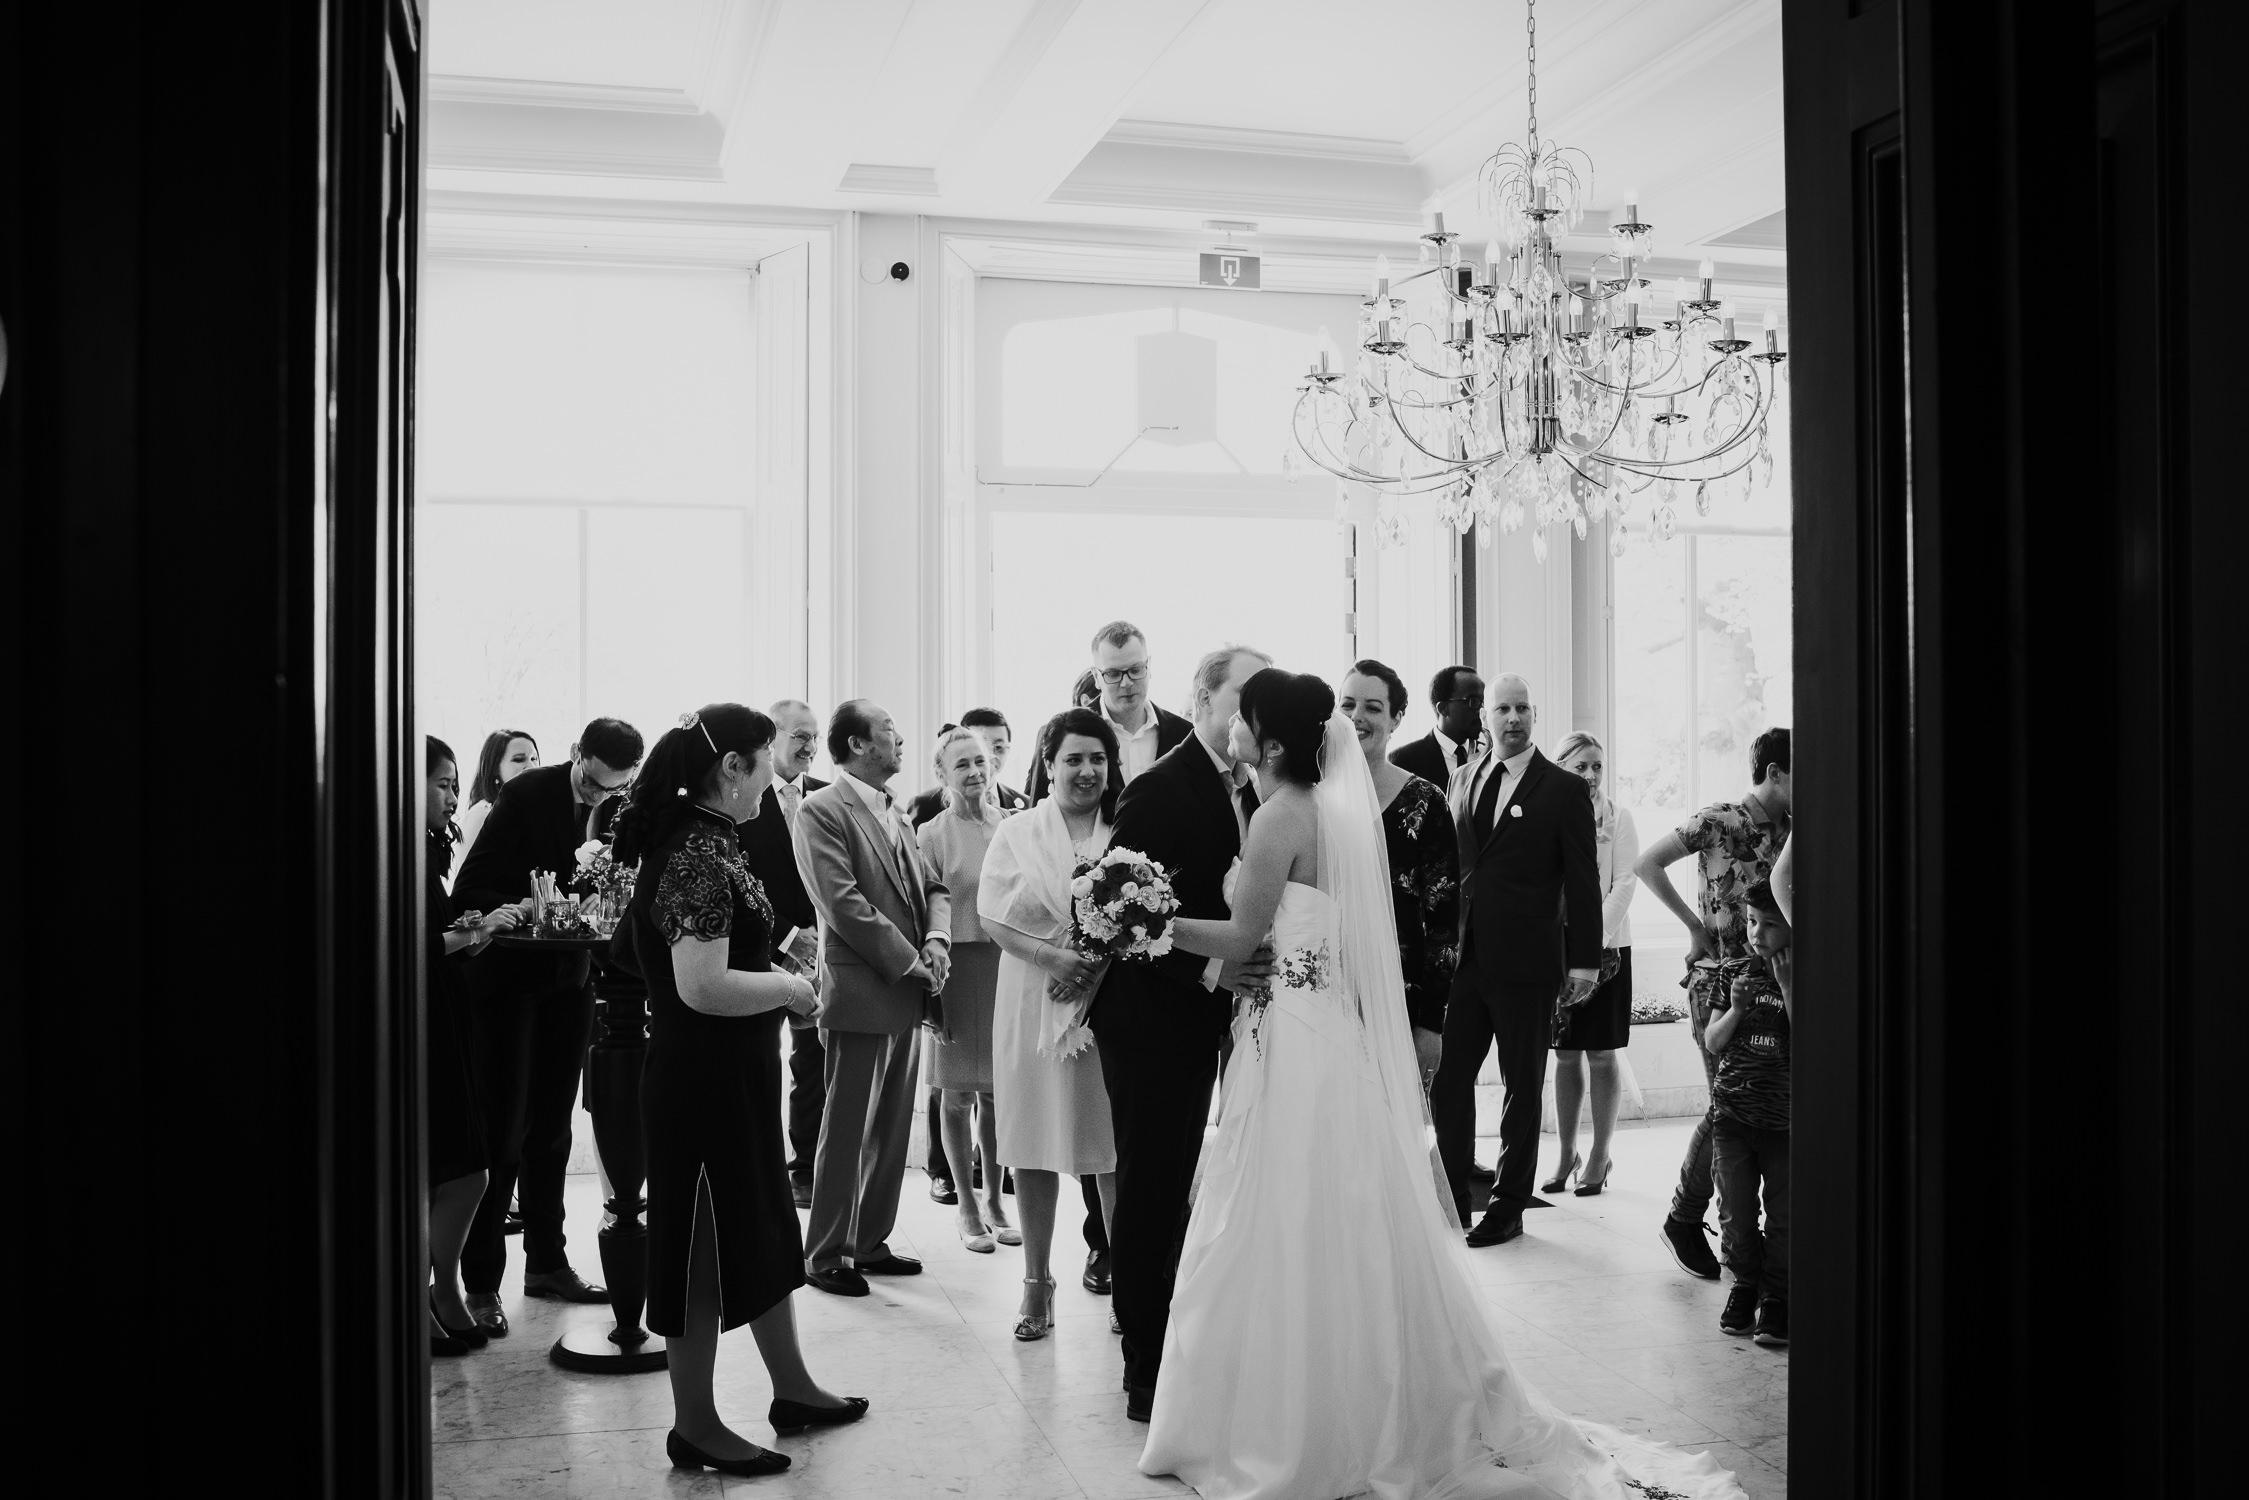 bruidsfotografie-amsterdam-utrecht-trouwfotograaf-mark-hadden-wedding-photography-Yun & Geert-141-2-2.jpg